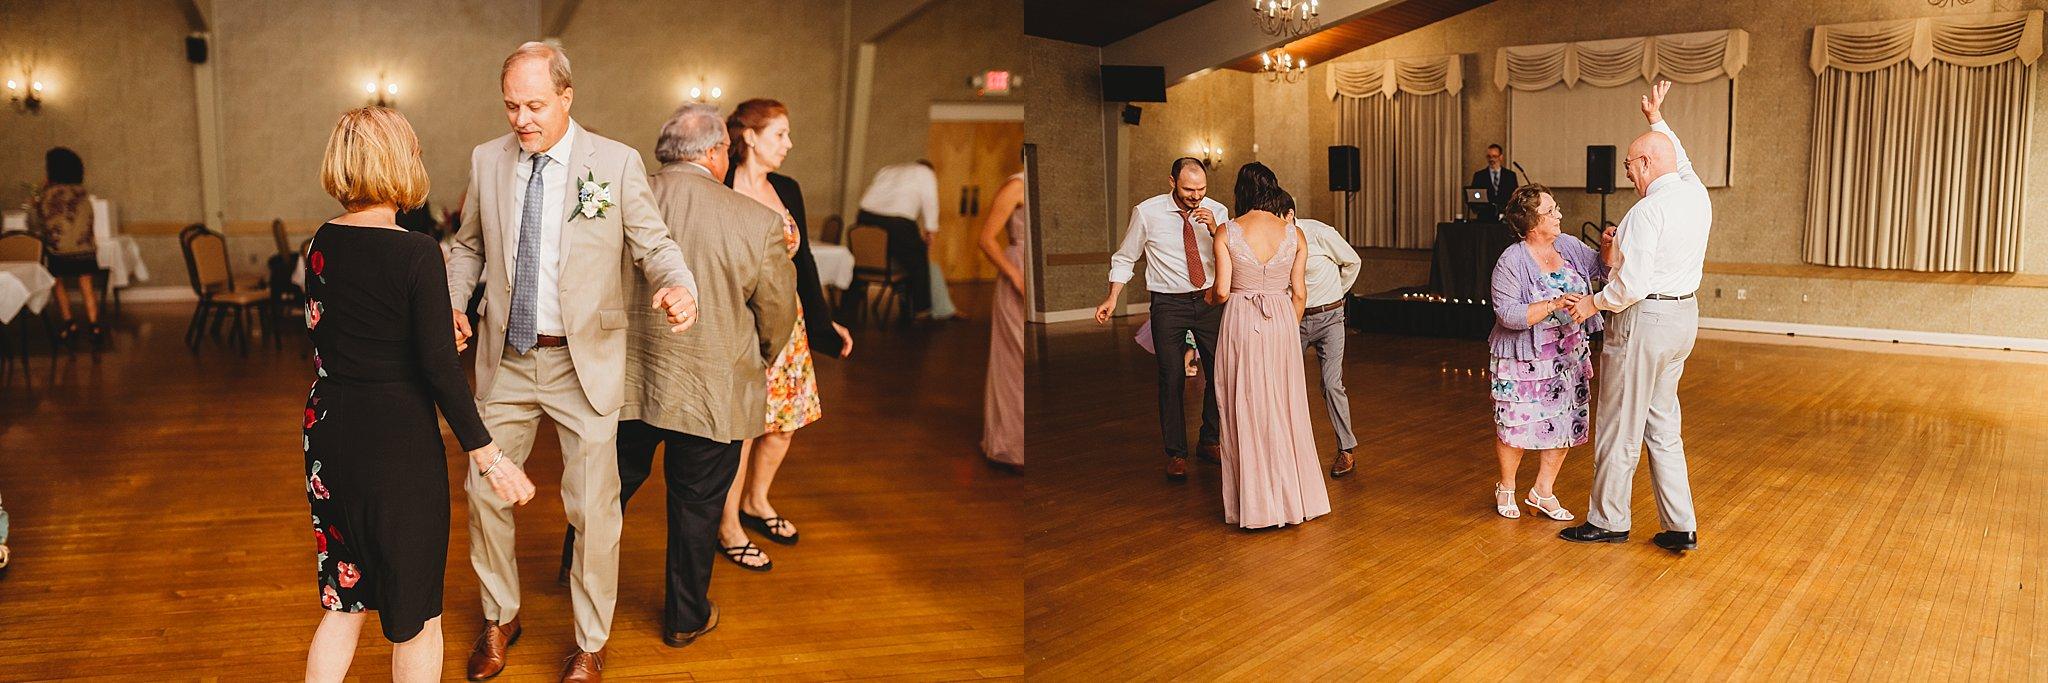 Gumlaw_Wedding_0101.jpg